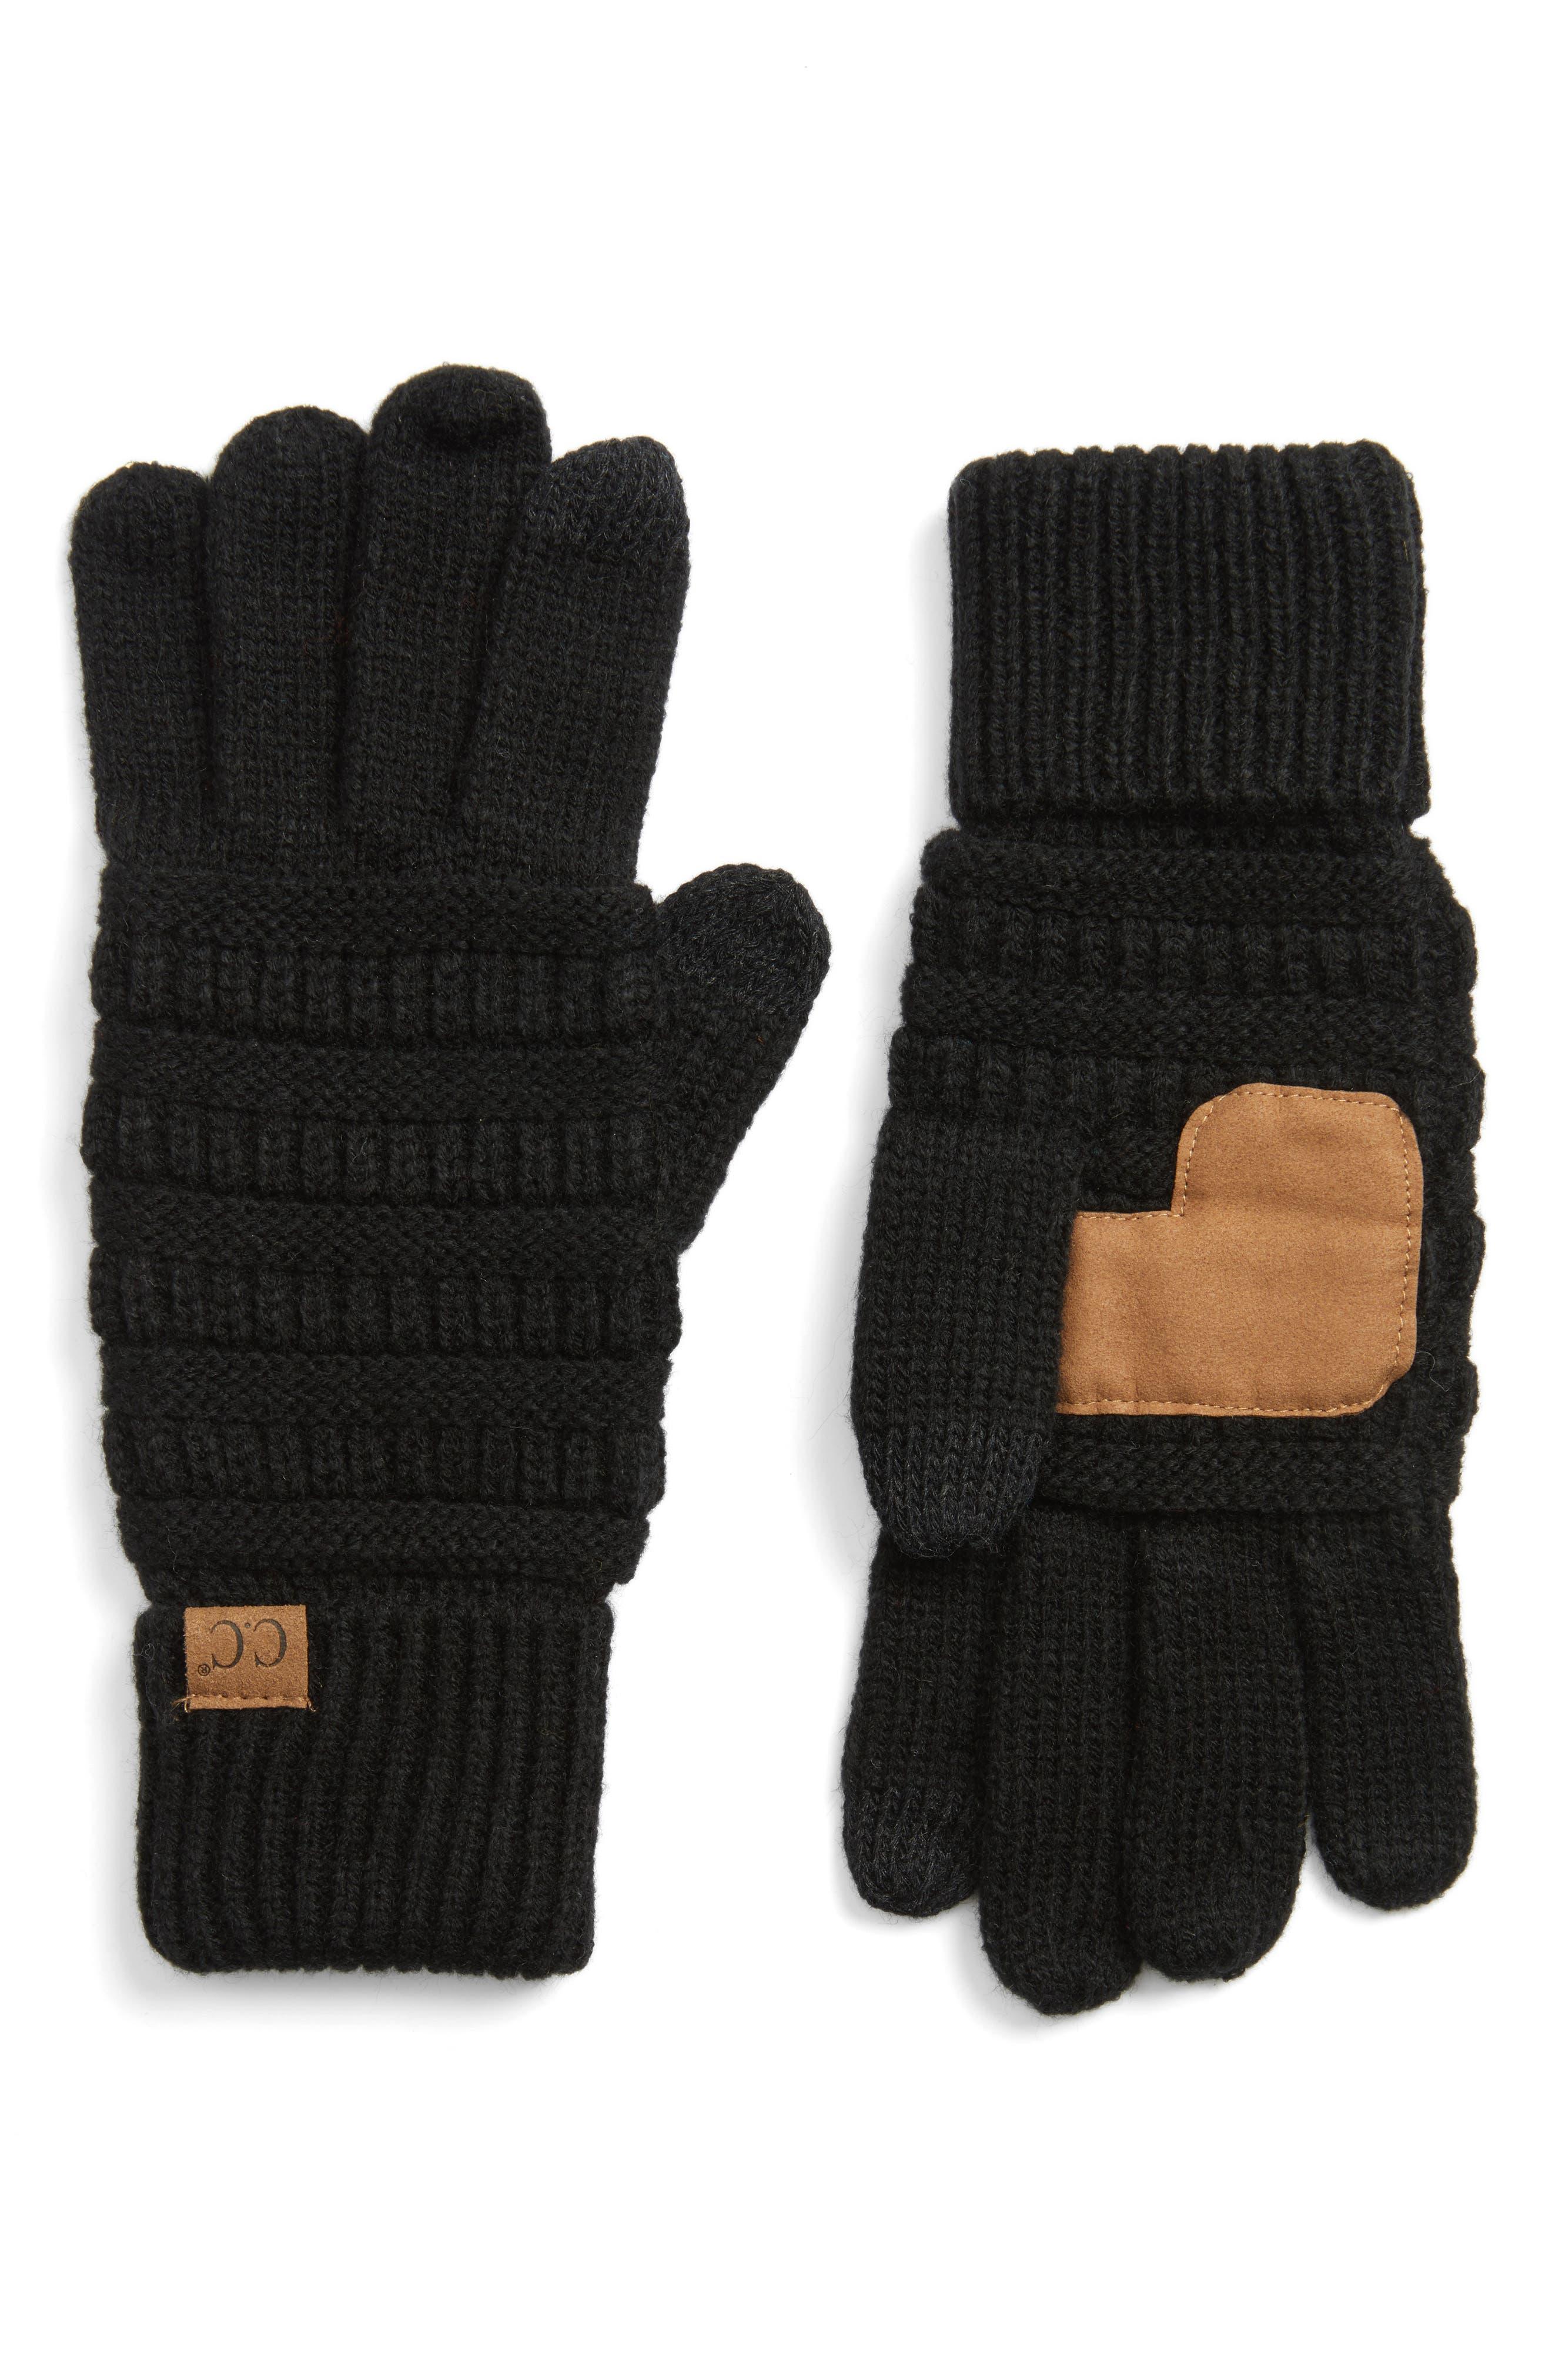 Main Image - CC Rib Knit Tech Gloves